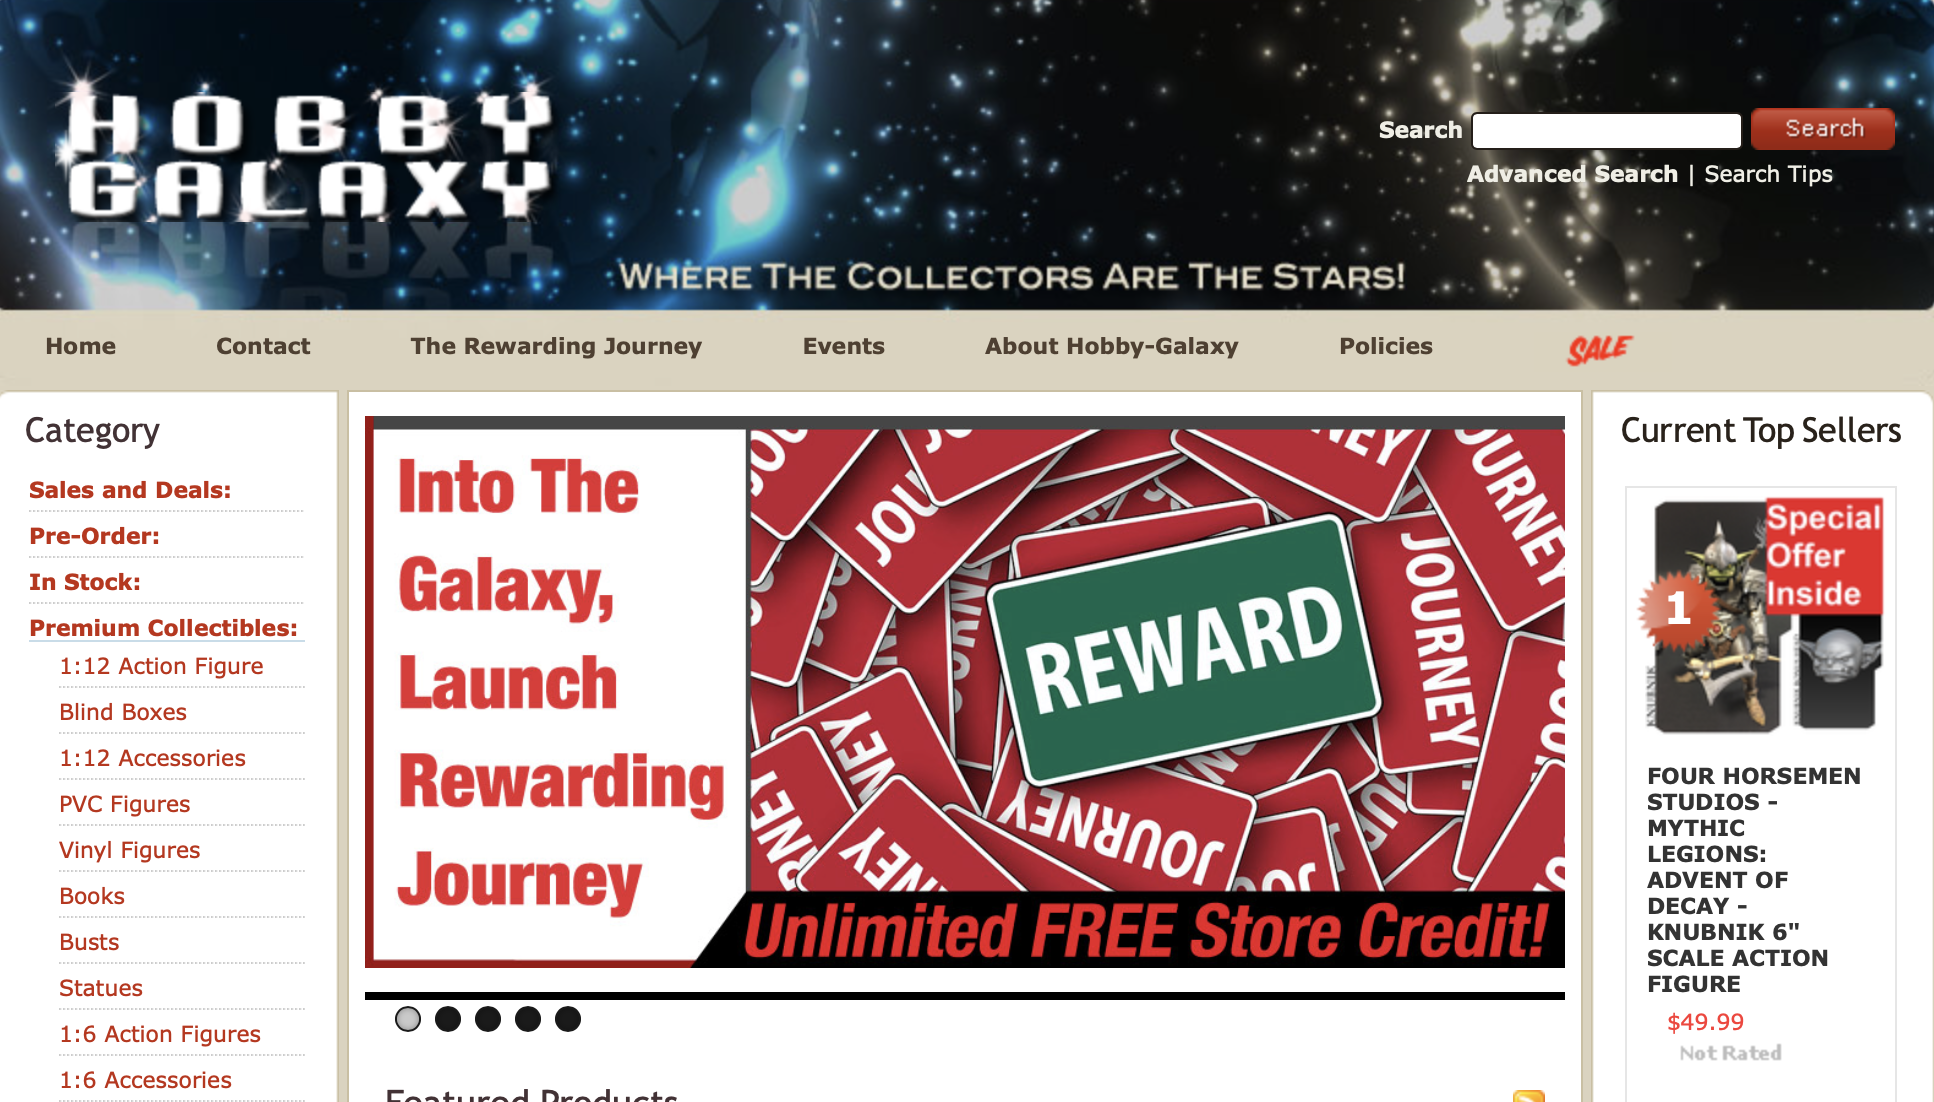 http://www.hobby-galaxy.com